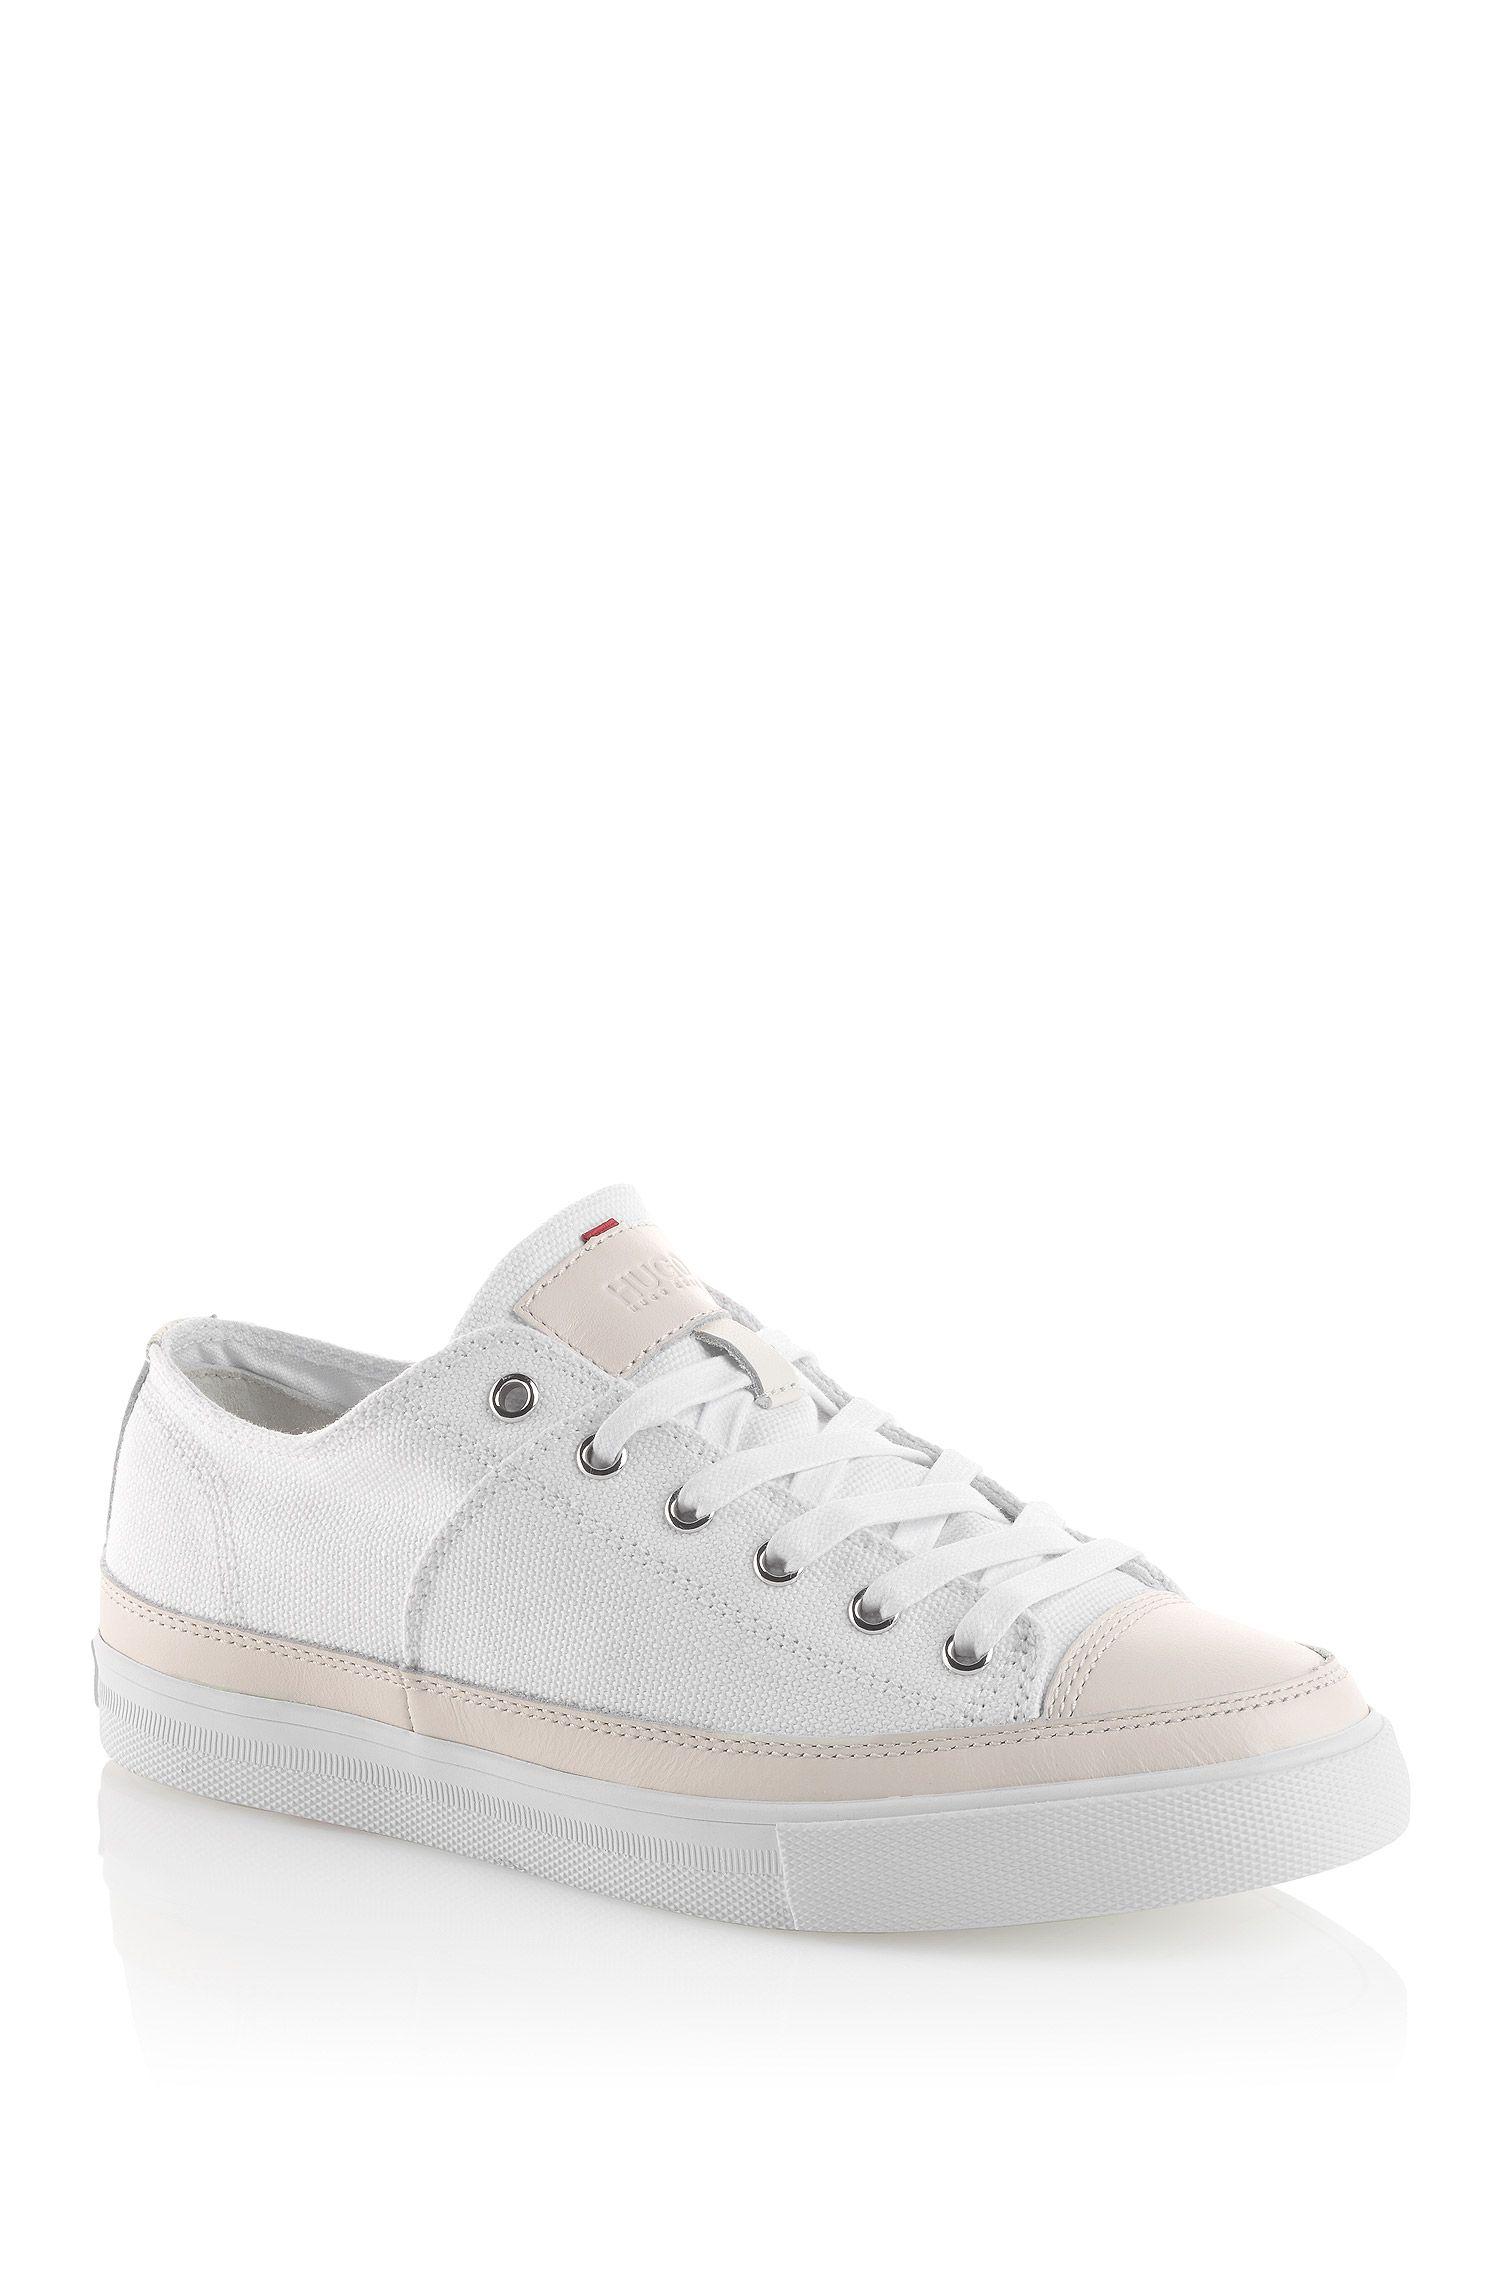 Sneakers aus Canvas mit Lederbesatz: 'Vanille'